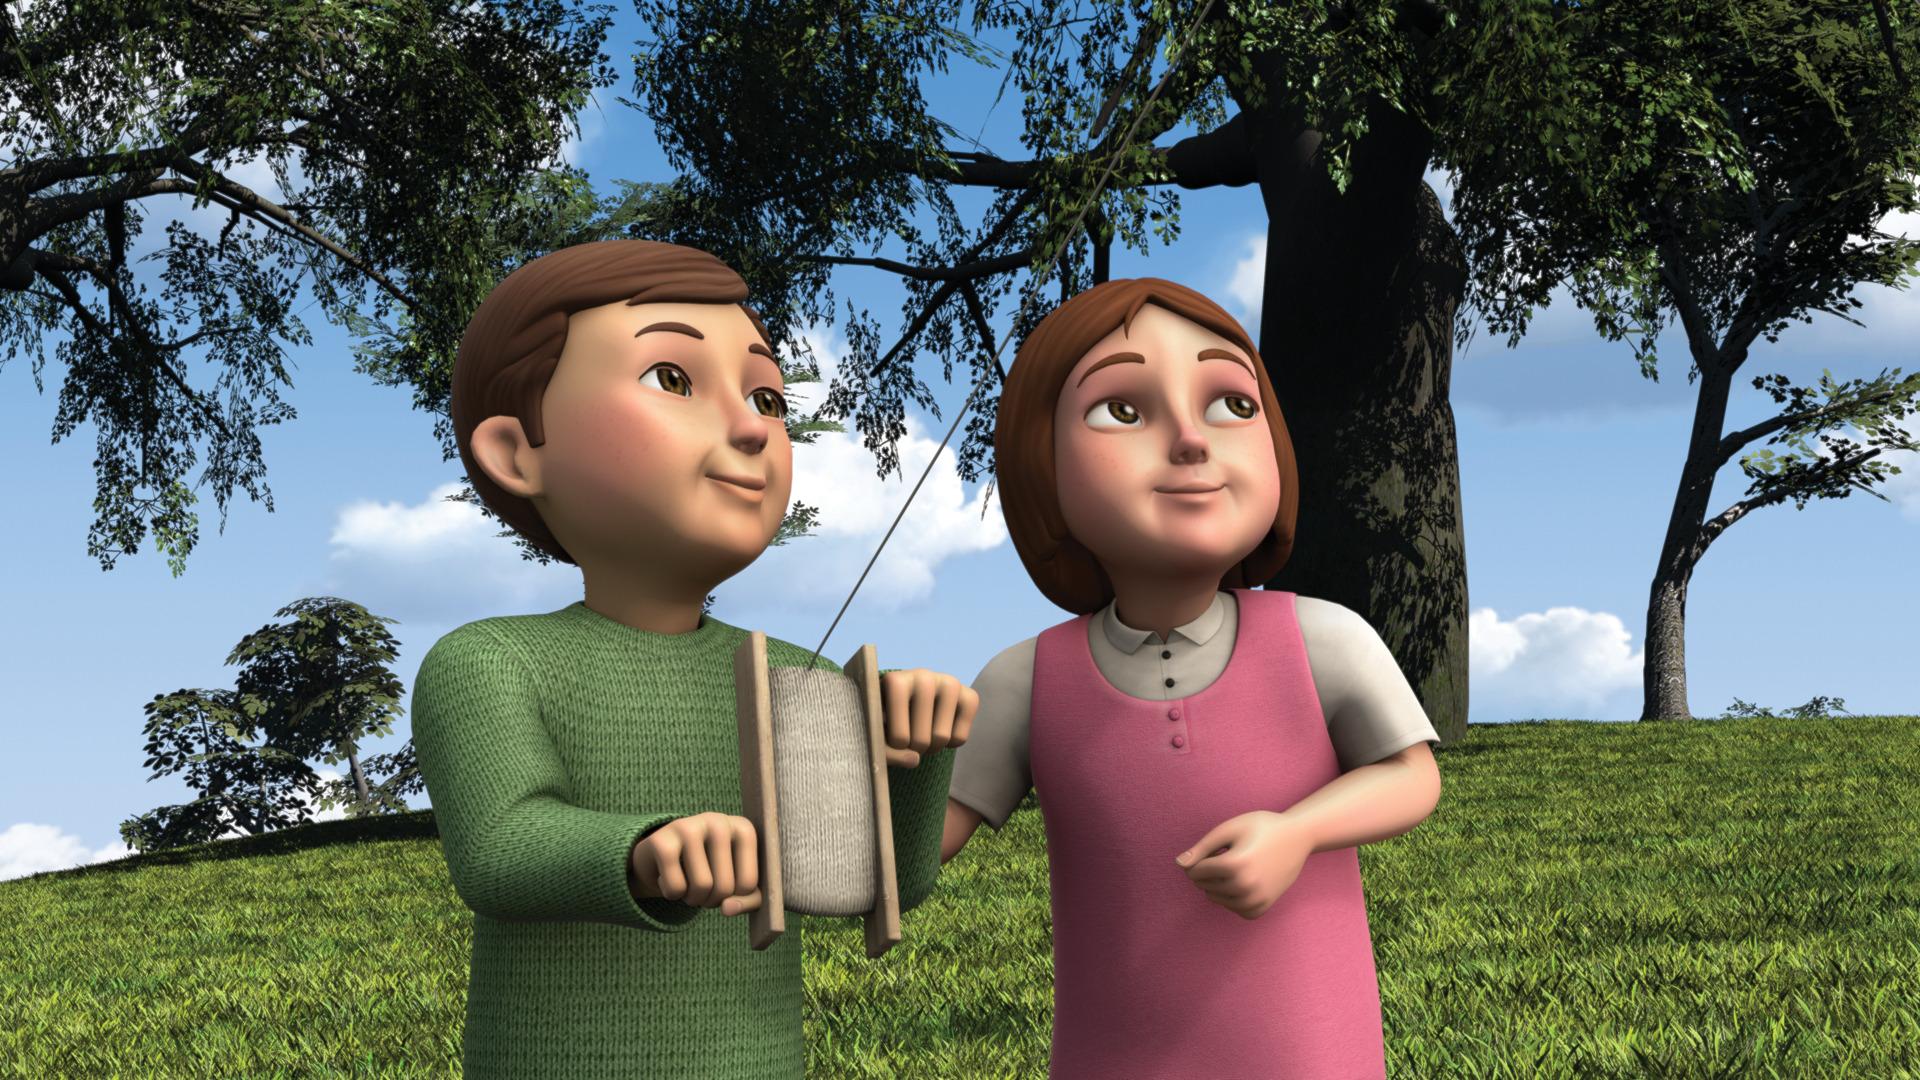 Thomas and the Runaway Kite